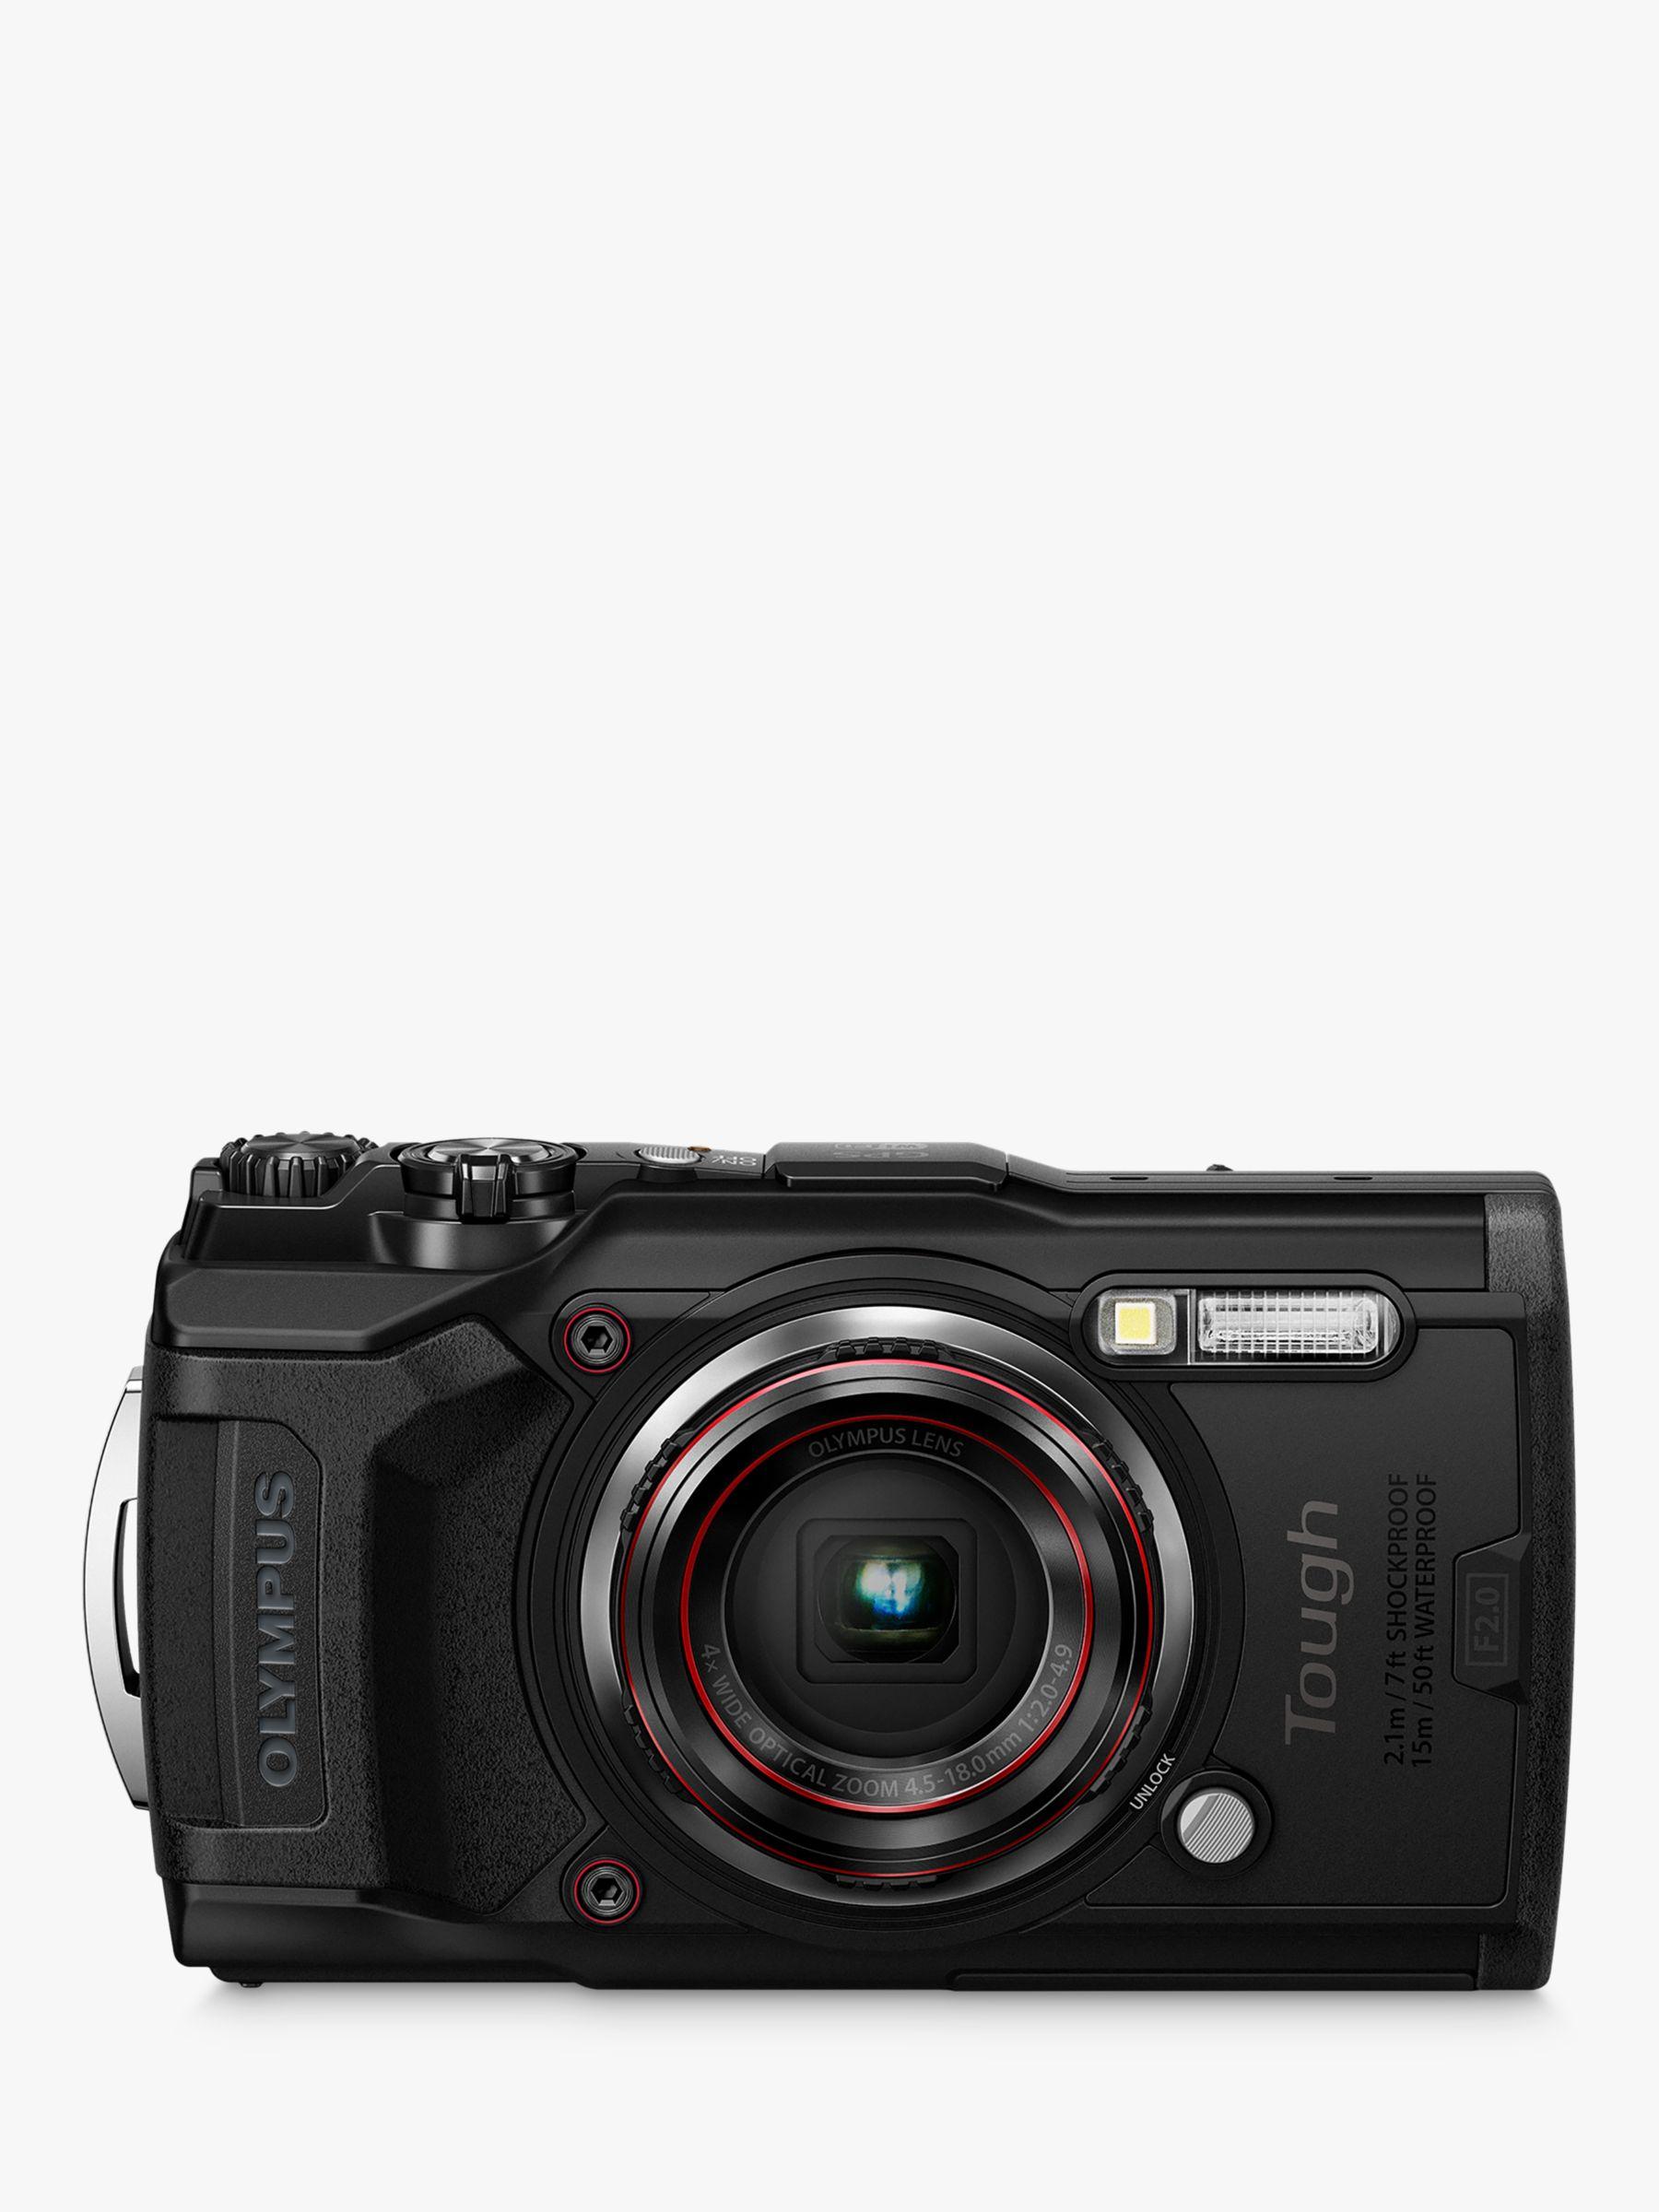 Olympus Tough TG-6 GPS Waterproof, Freezeproof, Shockproof, Dustproof  Compact Digital Camera, 12MP, 4K UHD, 4x Optical Zoom, Wi-Fi, RAW Shooting,  3